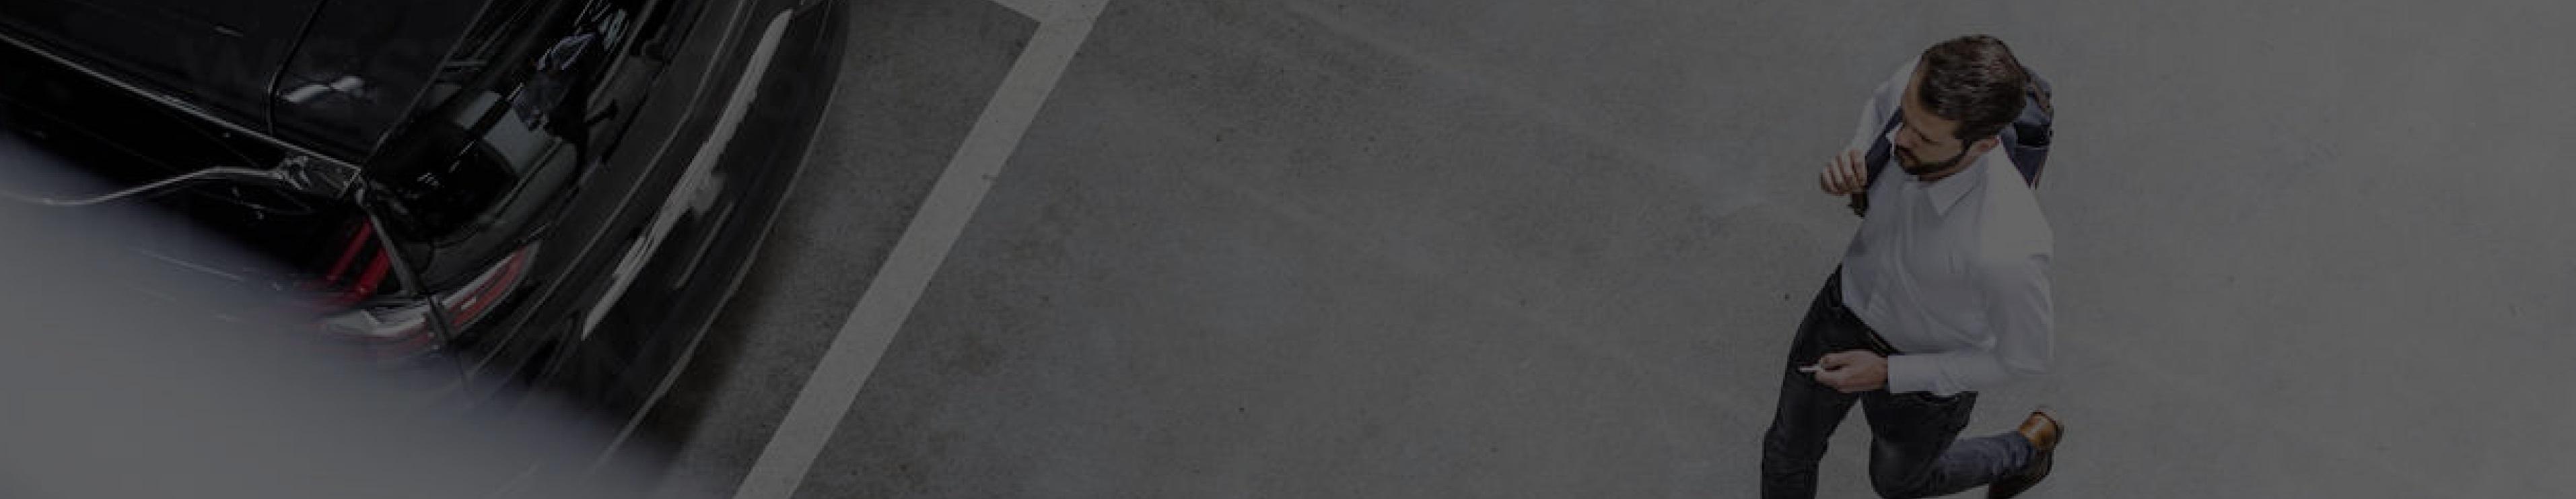 WK-InsolvenzPrem-03-21-Banner-3840x960px